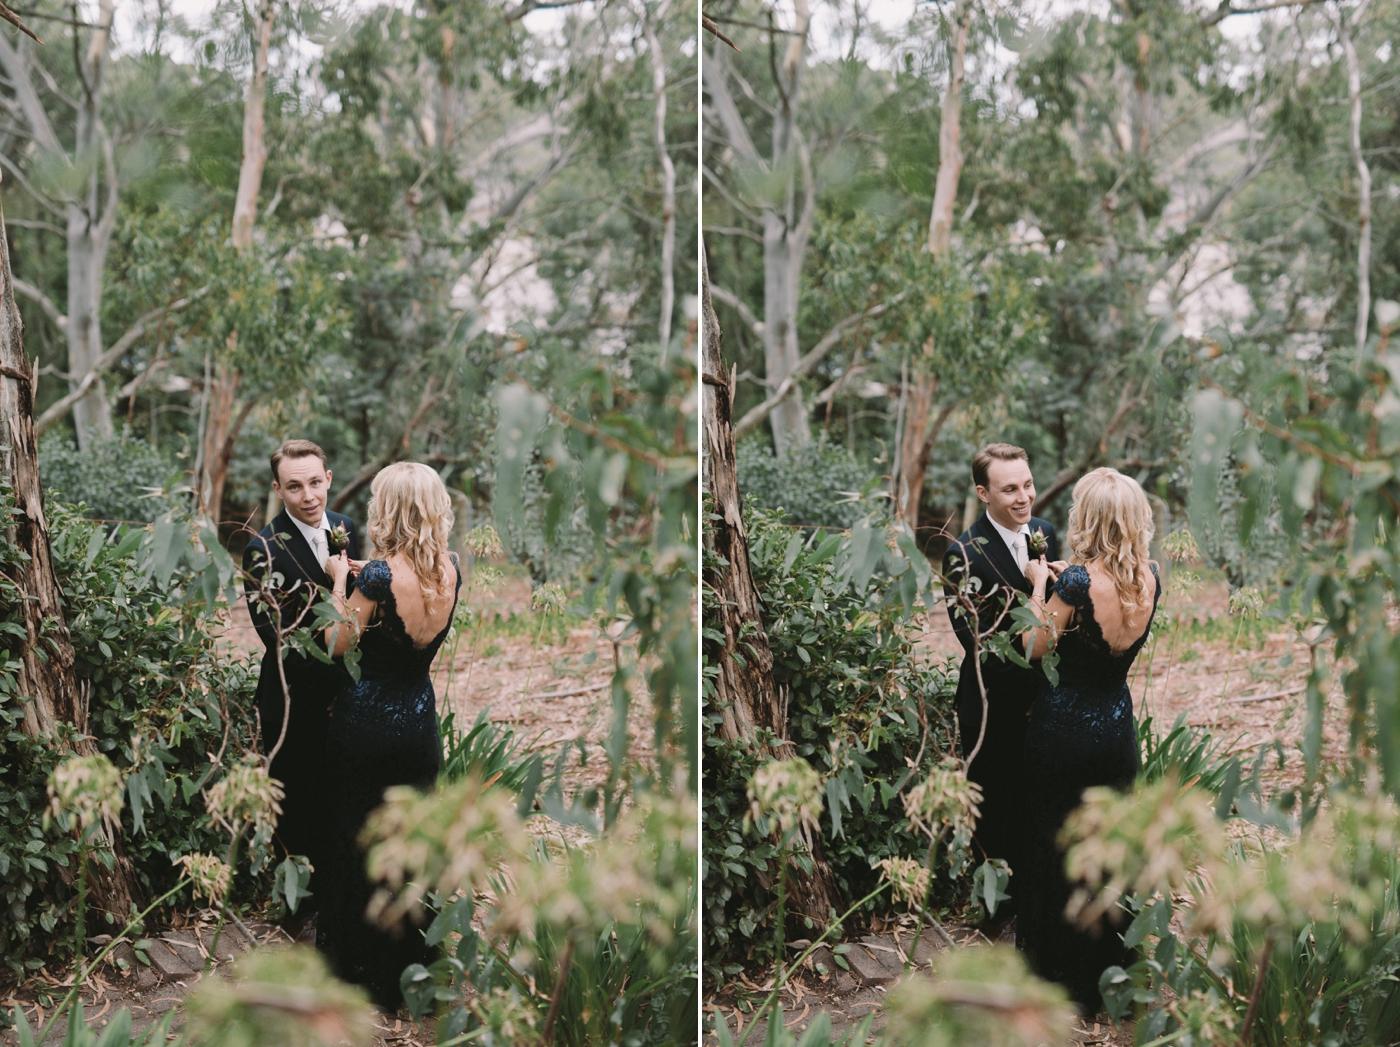 Jasmine and Adam - Natural wedding photographer in Adelaide - Candid Wedding Photographer Adelaide - www.katherineschultzphotography.com 6